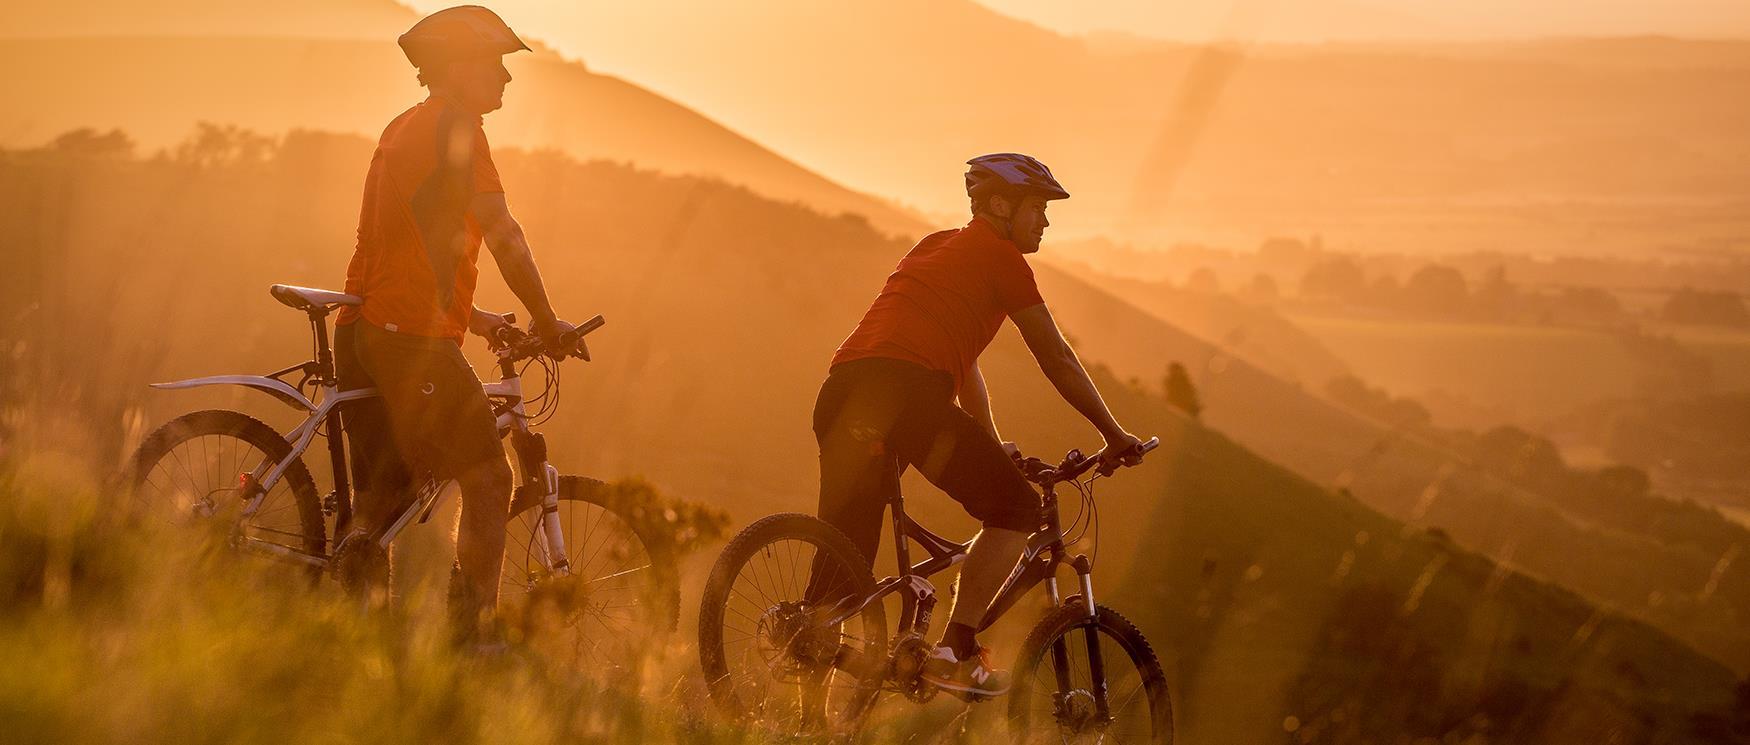 Mountain Biking in Hampshire